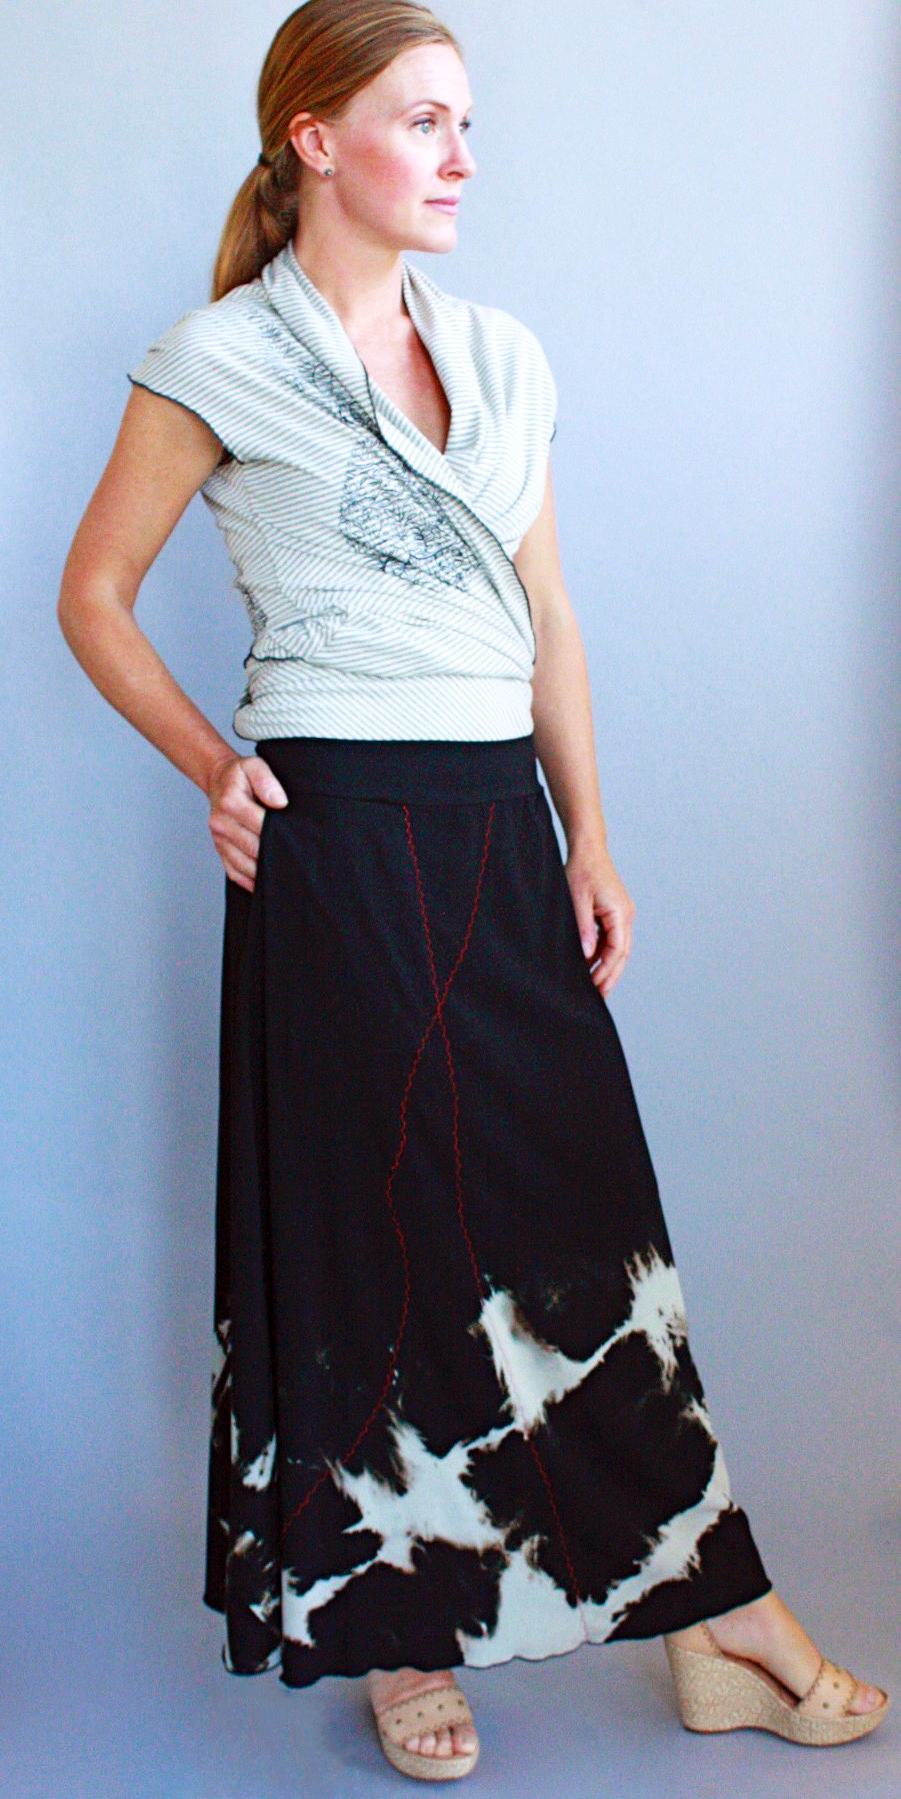 Luna Cardigan & Beeline Skirt.